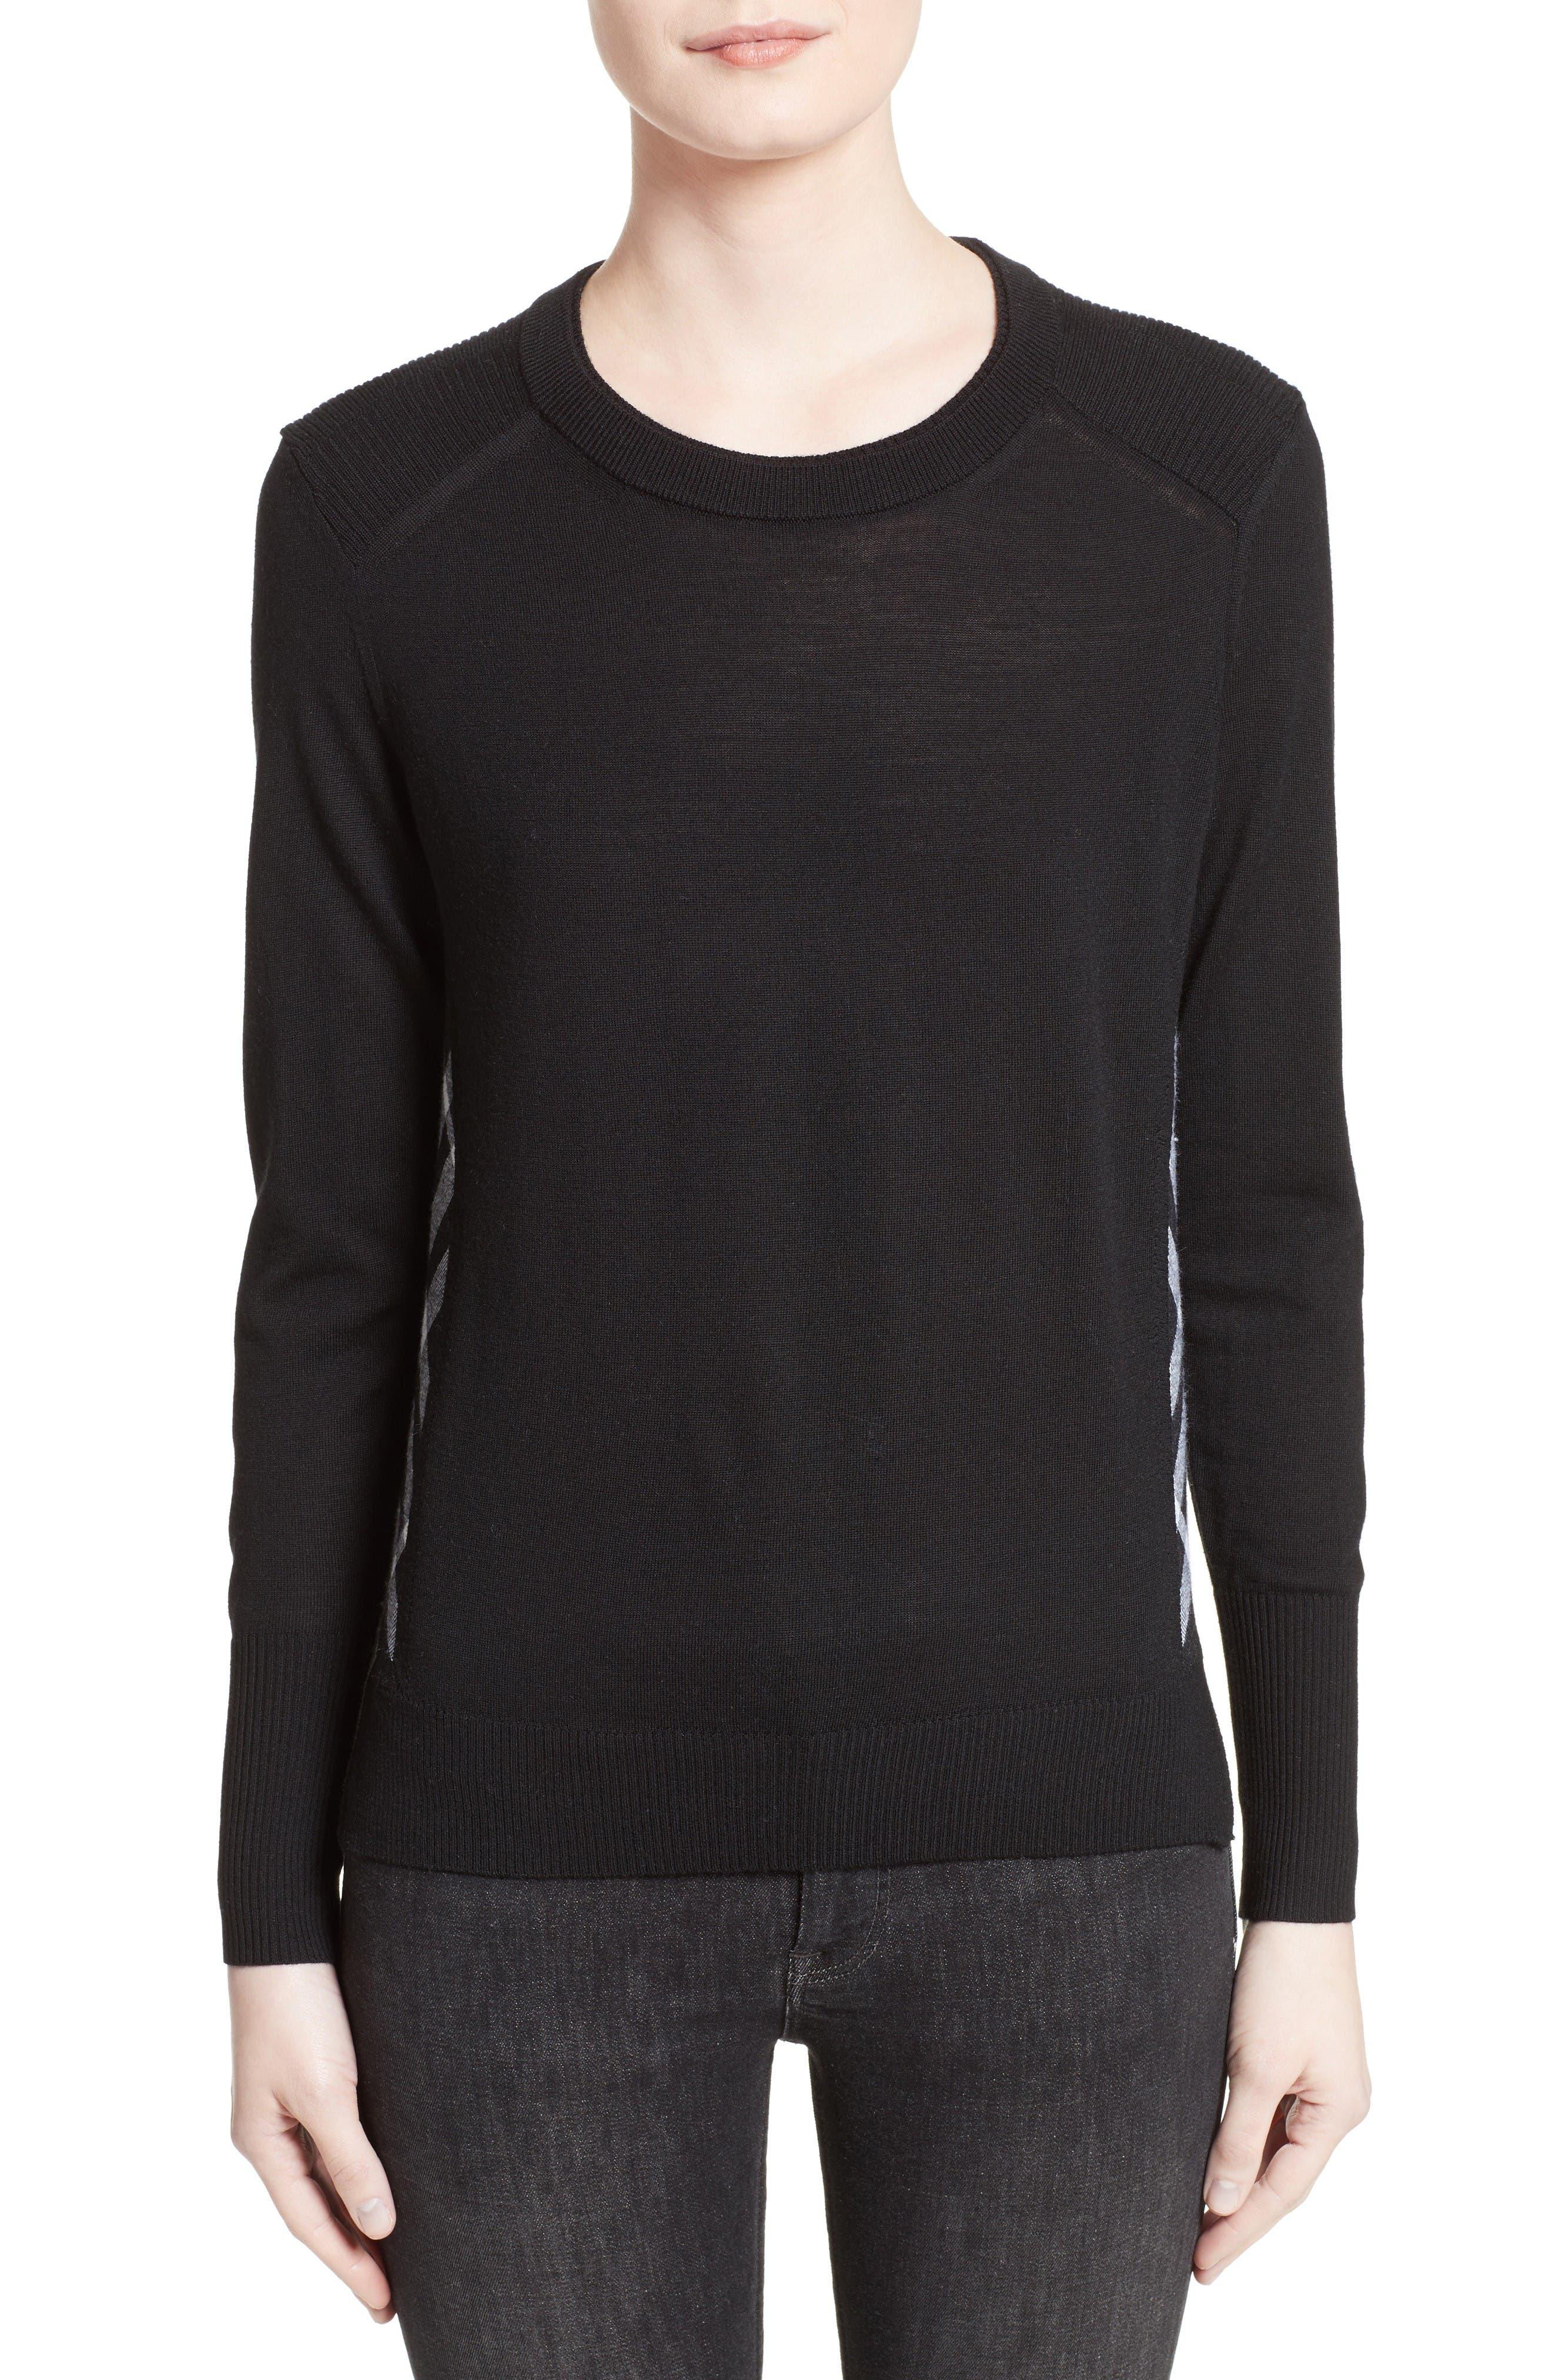 Burberry Meigan Merino Wool Sweater